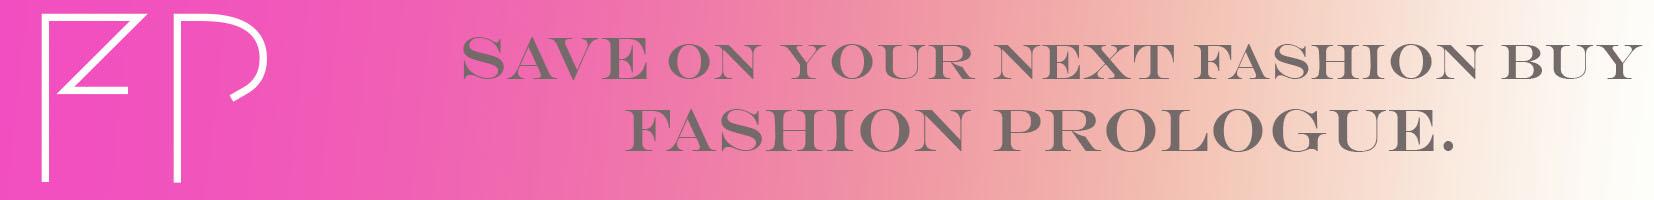 Fashion Prologue - save on fashion banner-pink.jpg